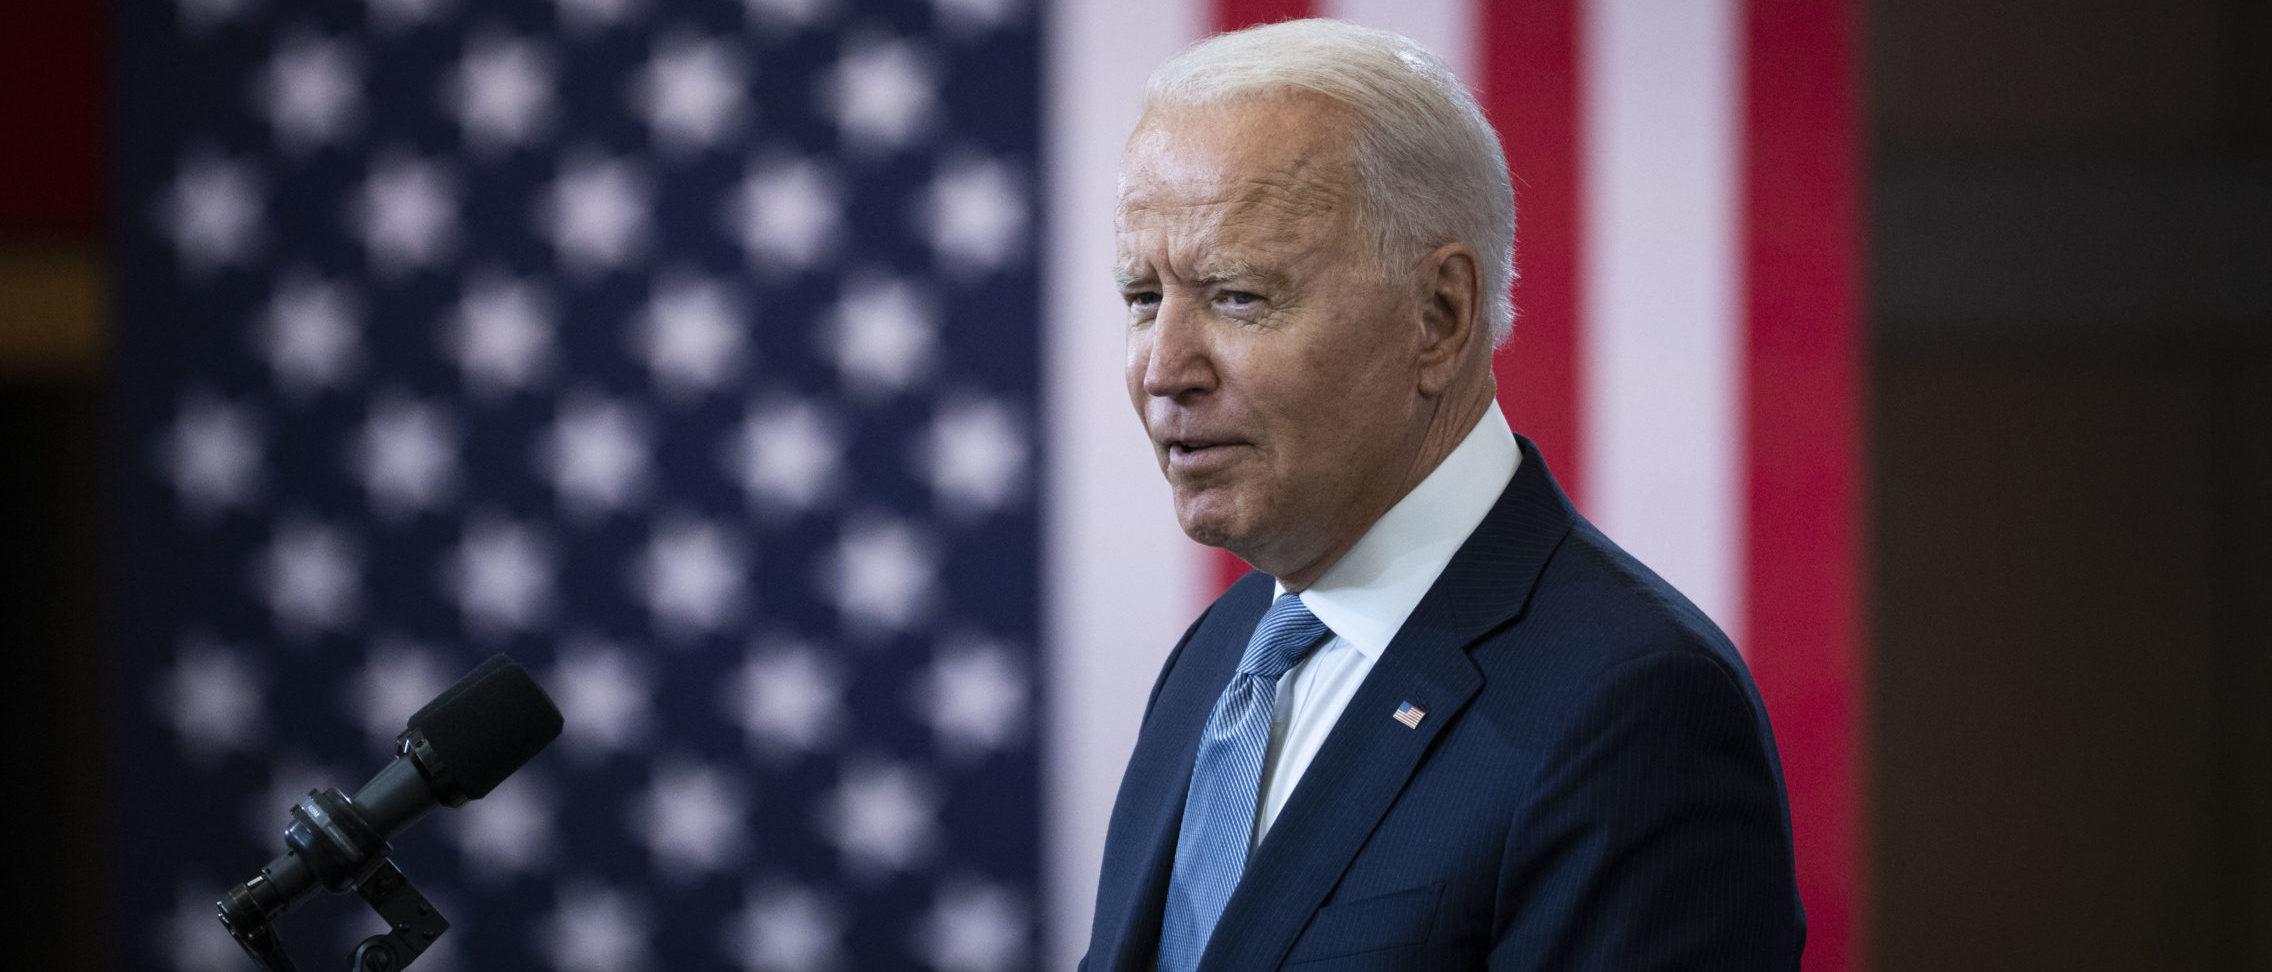 President Joe Biden speaks about voting rights on July 13 in Philadelphia, Pennsylvania. (Drew Angerer/Getty Images)